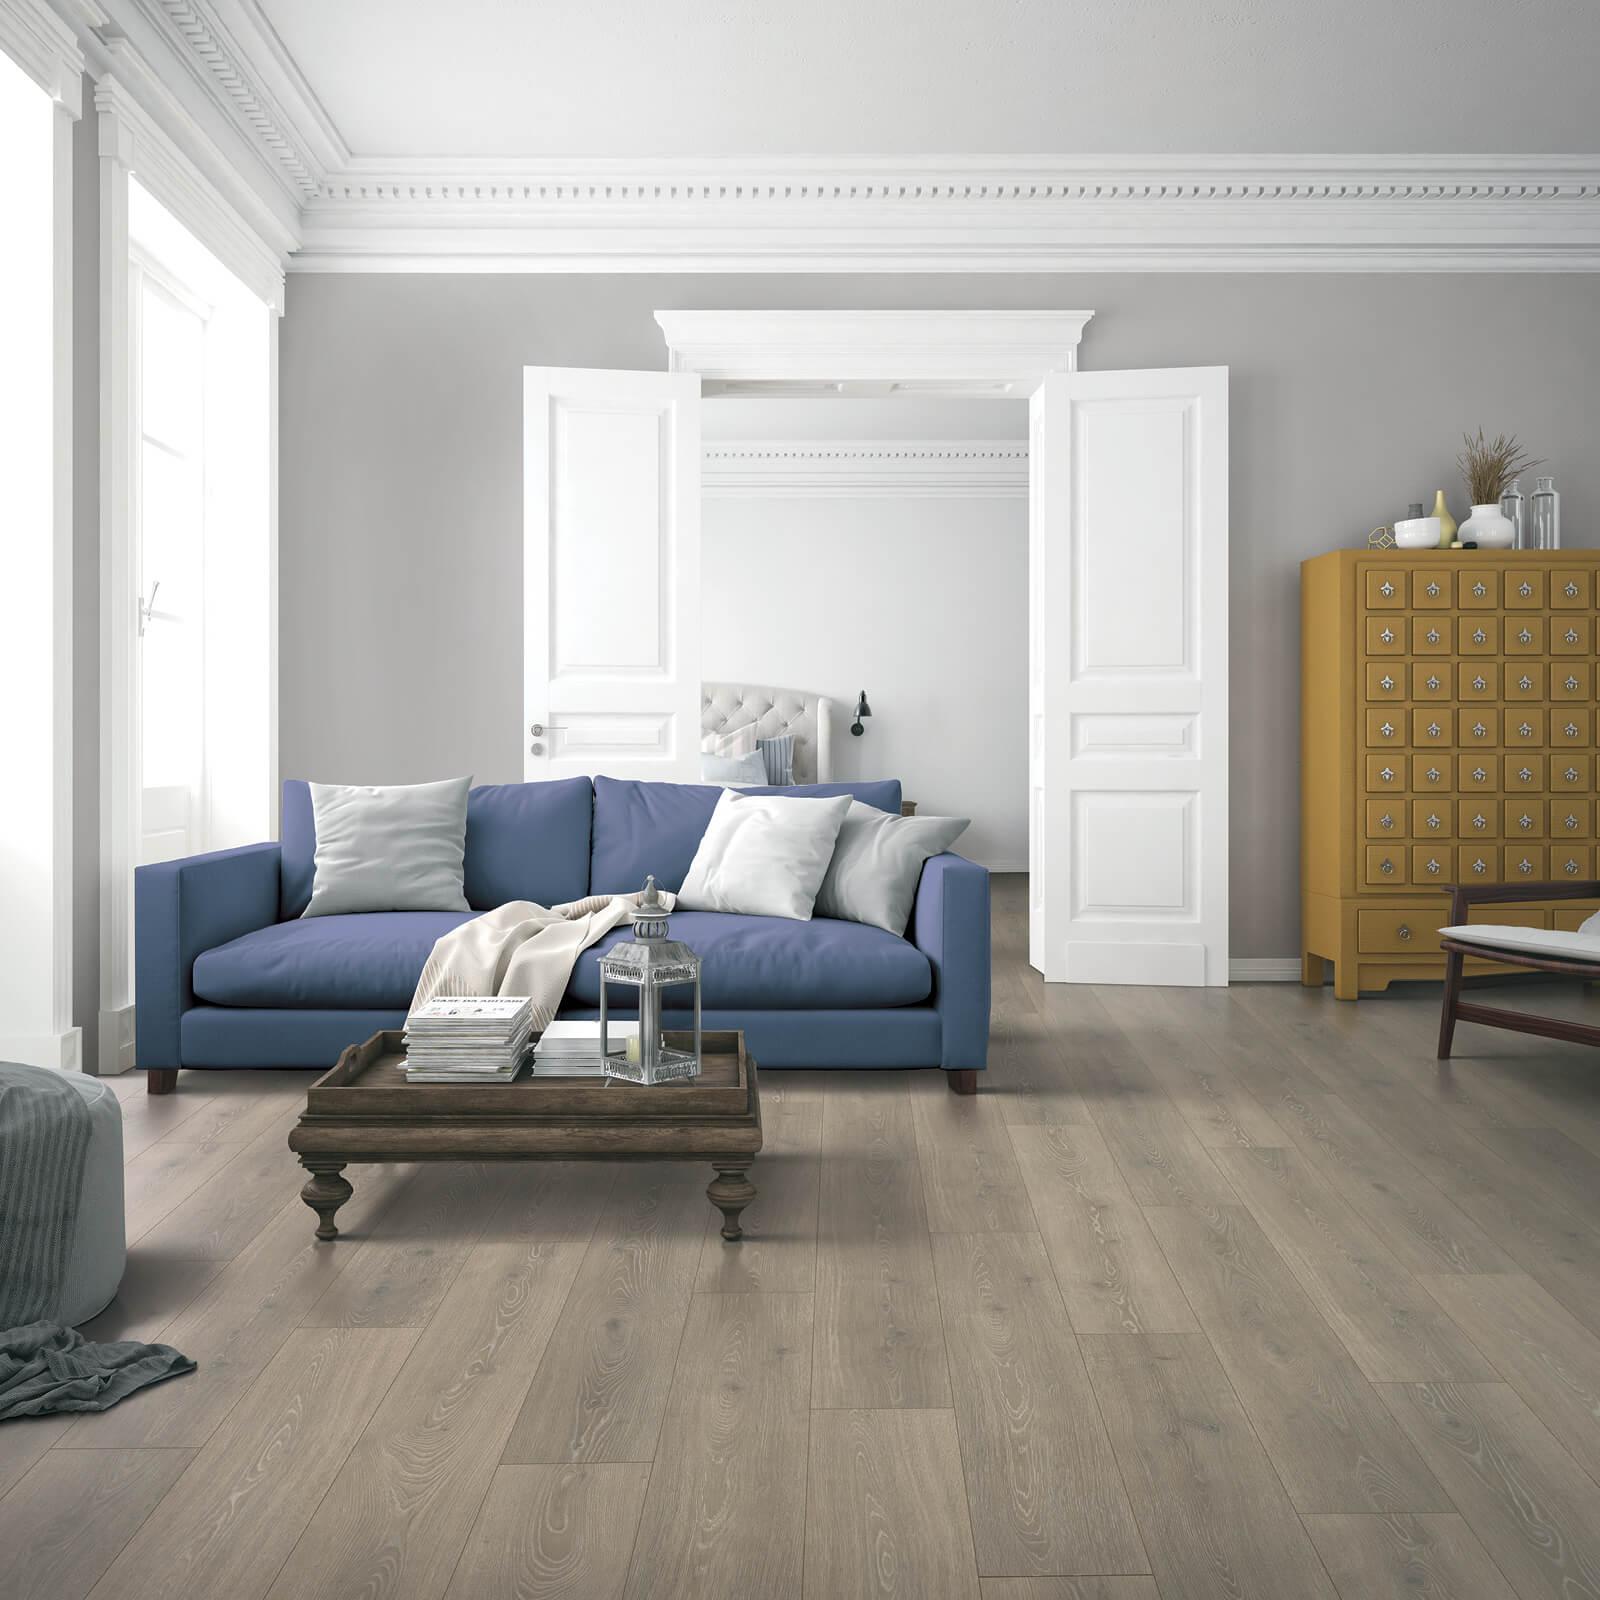 Vinyl Floors in Living Room | Haley's Flooring & Interiors